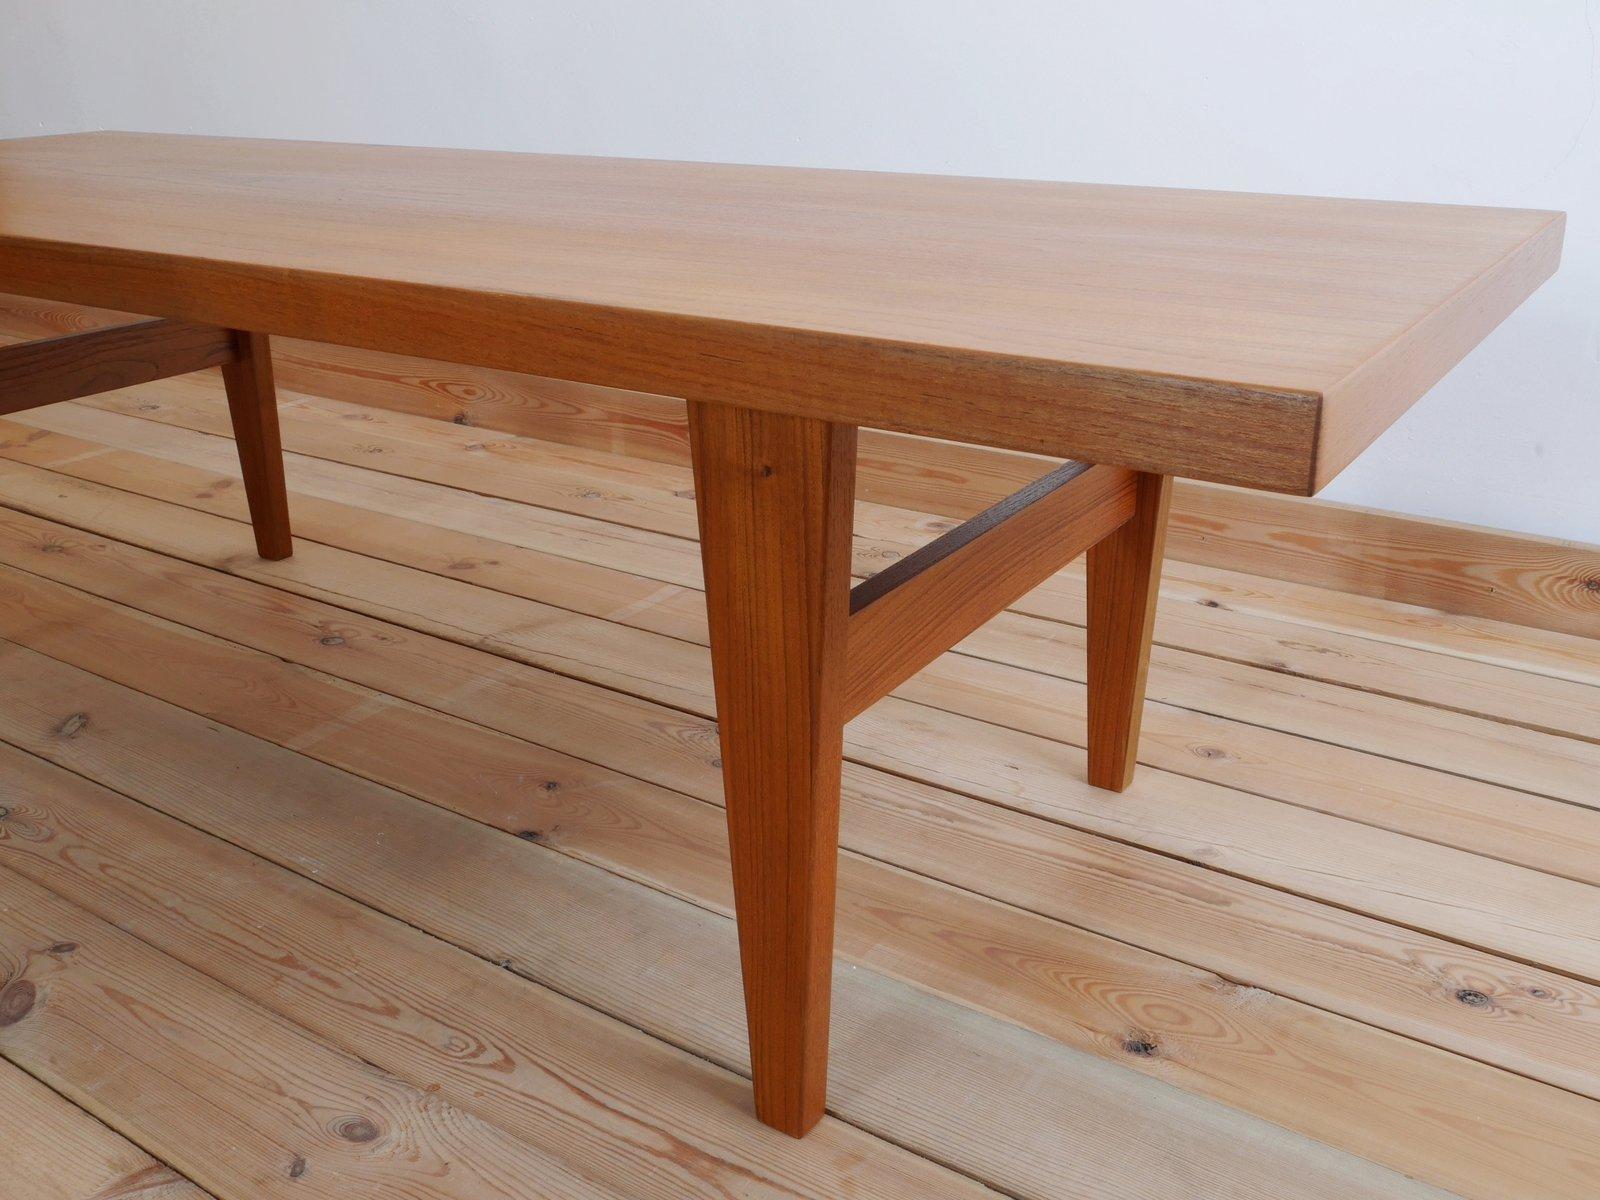 Danish Teak Coffee Table 1960s for sale at Pamono